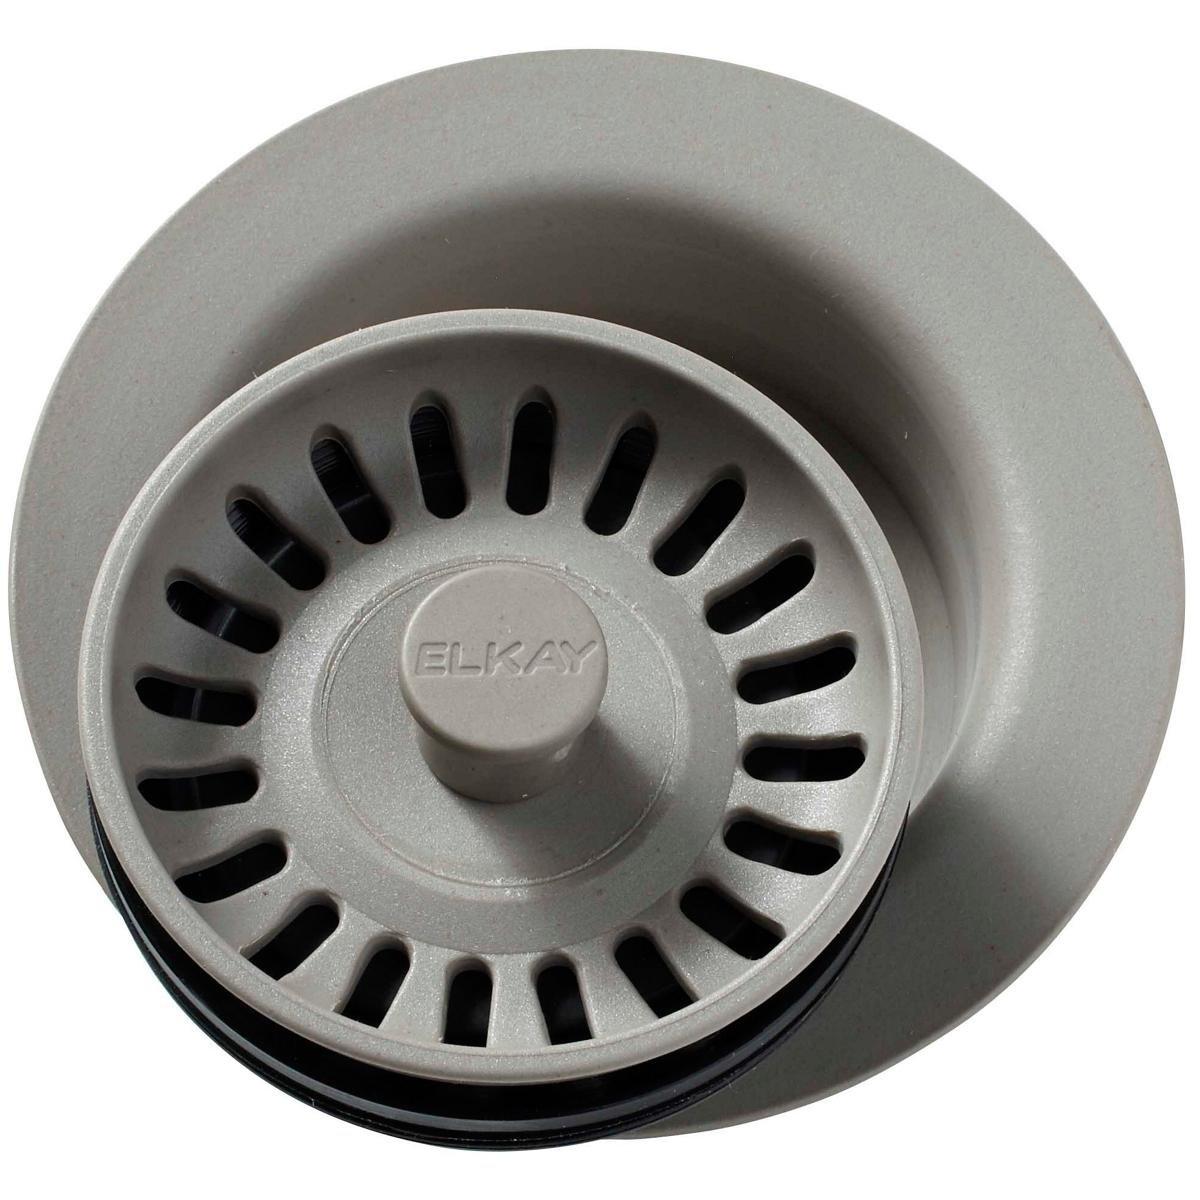 Elkay LKQD35GR Greige Polymer Disposer Flange with Removable Basket Strainer and Rubber Stopper by Elkay